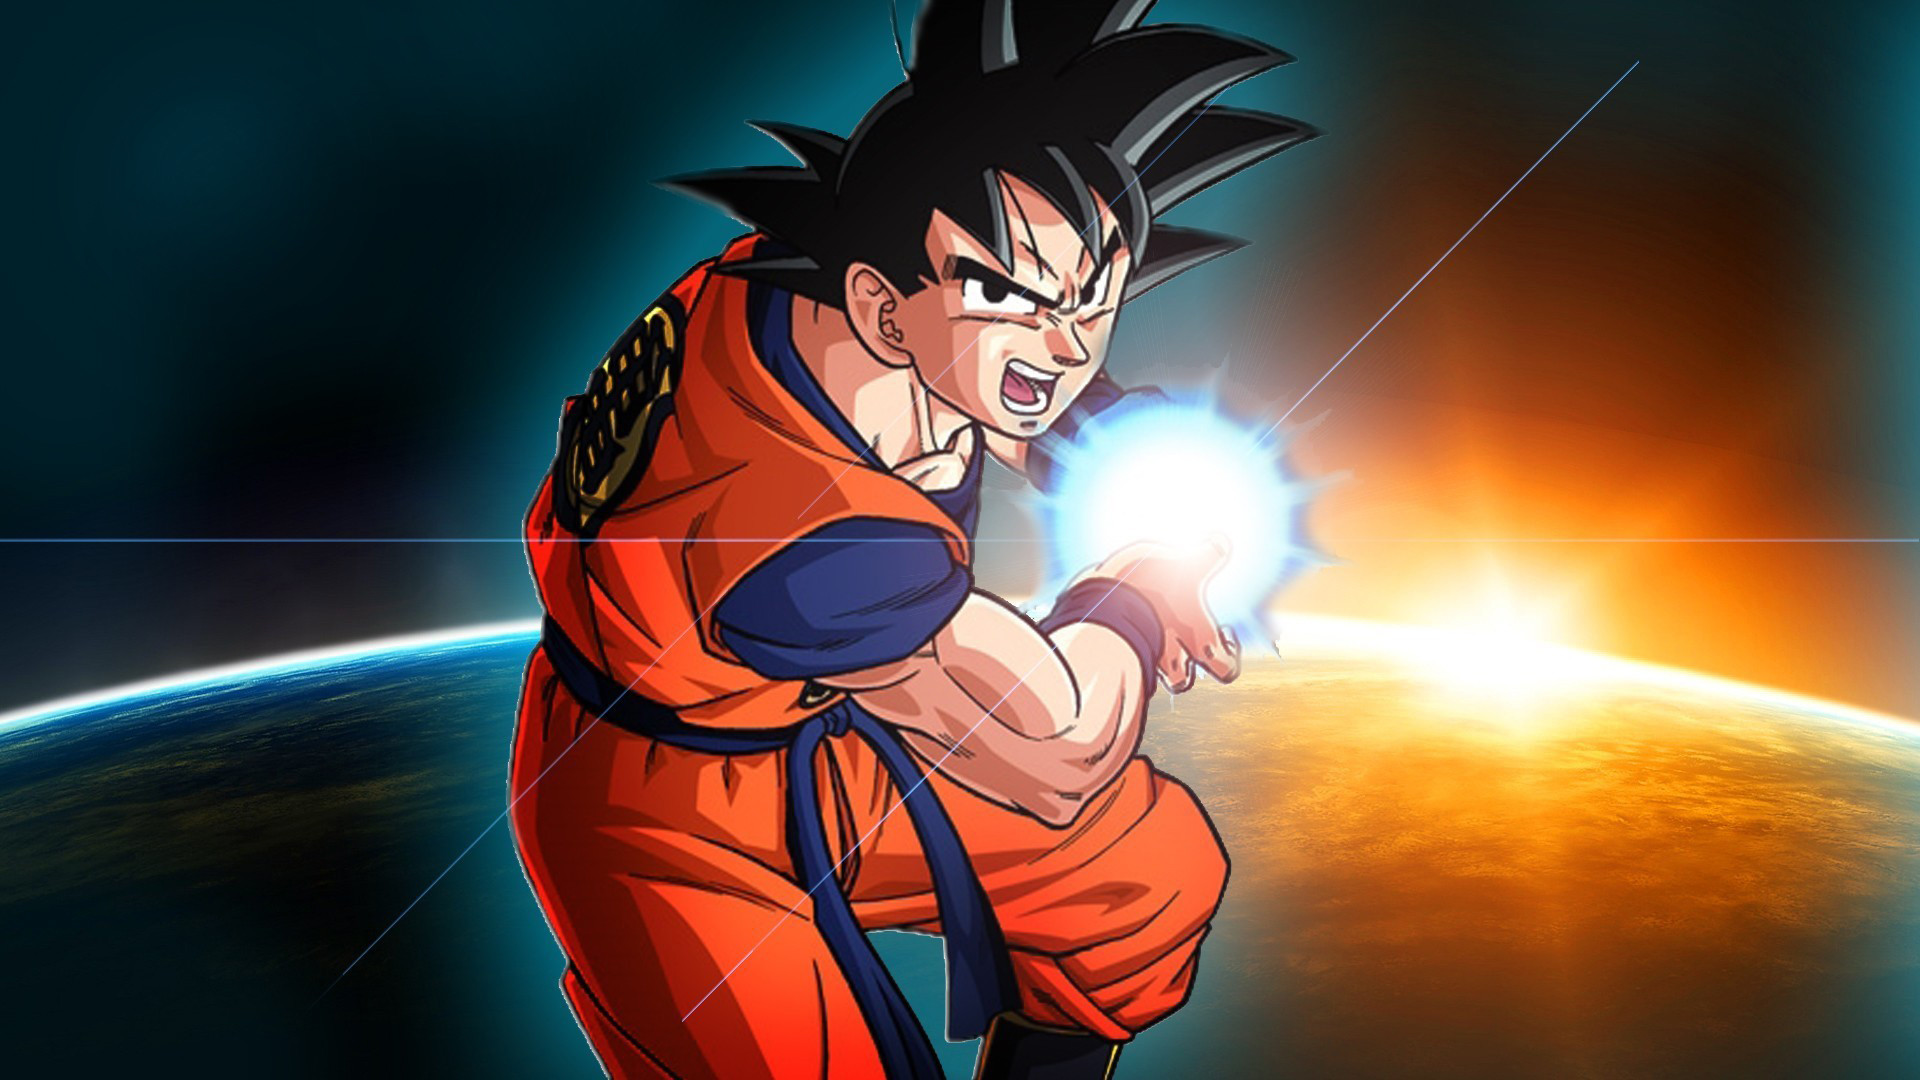 Dbz Goku Wallpapers Wallpapertag